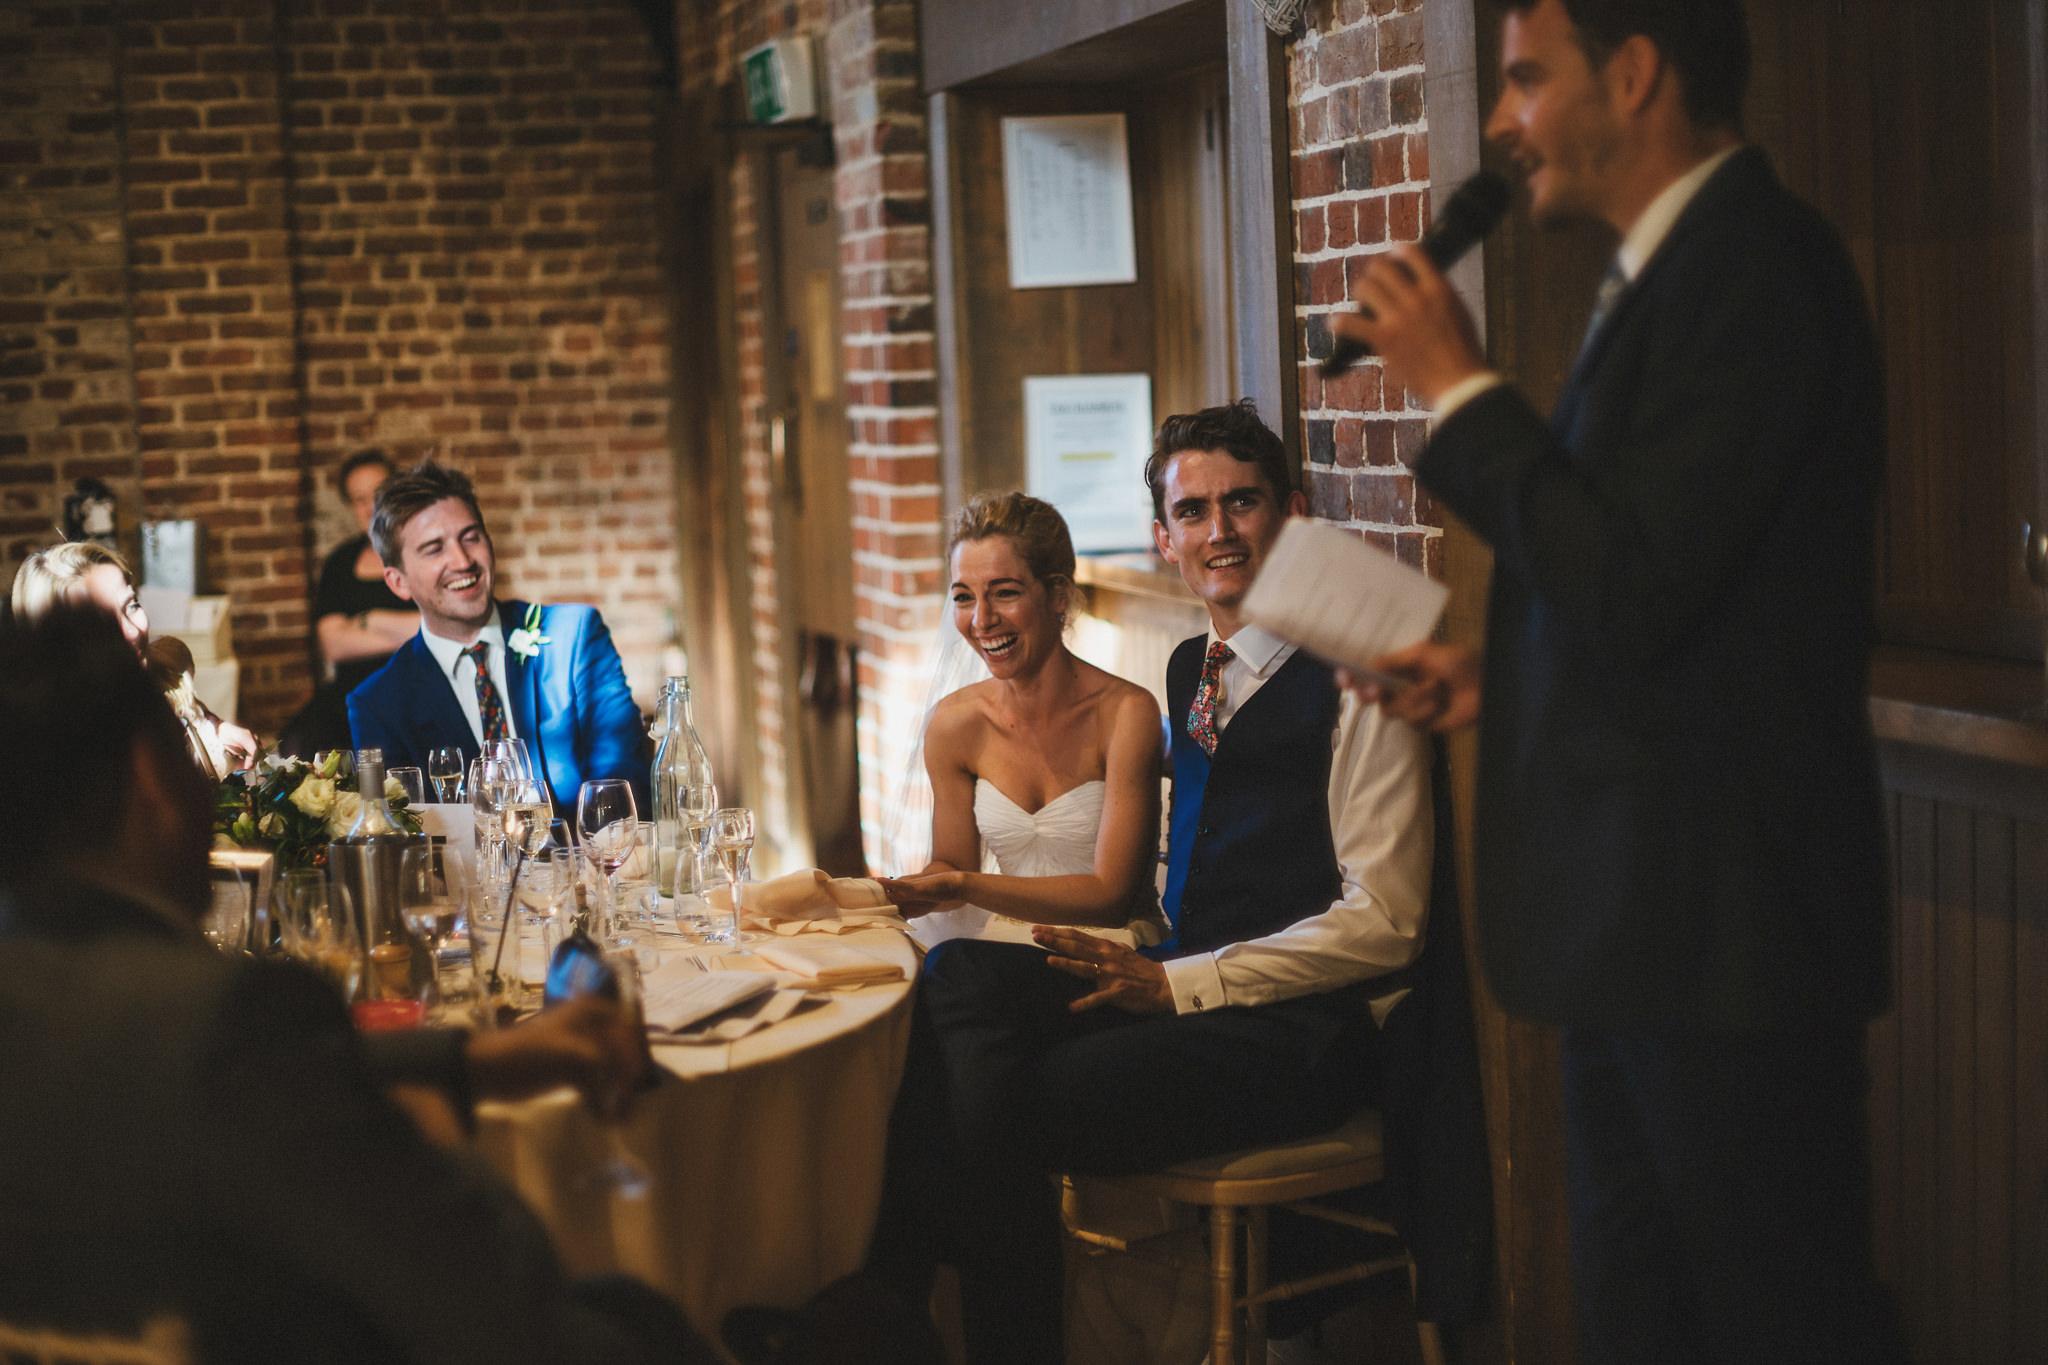 paul-marbrook-Gaynes-Park Wedding-Photographer-90120